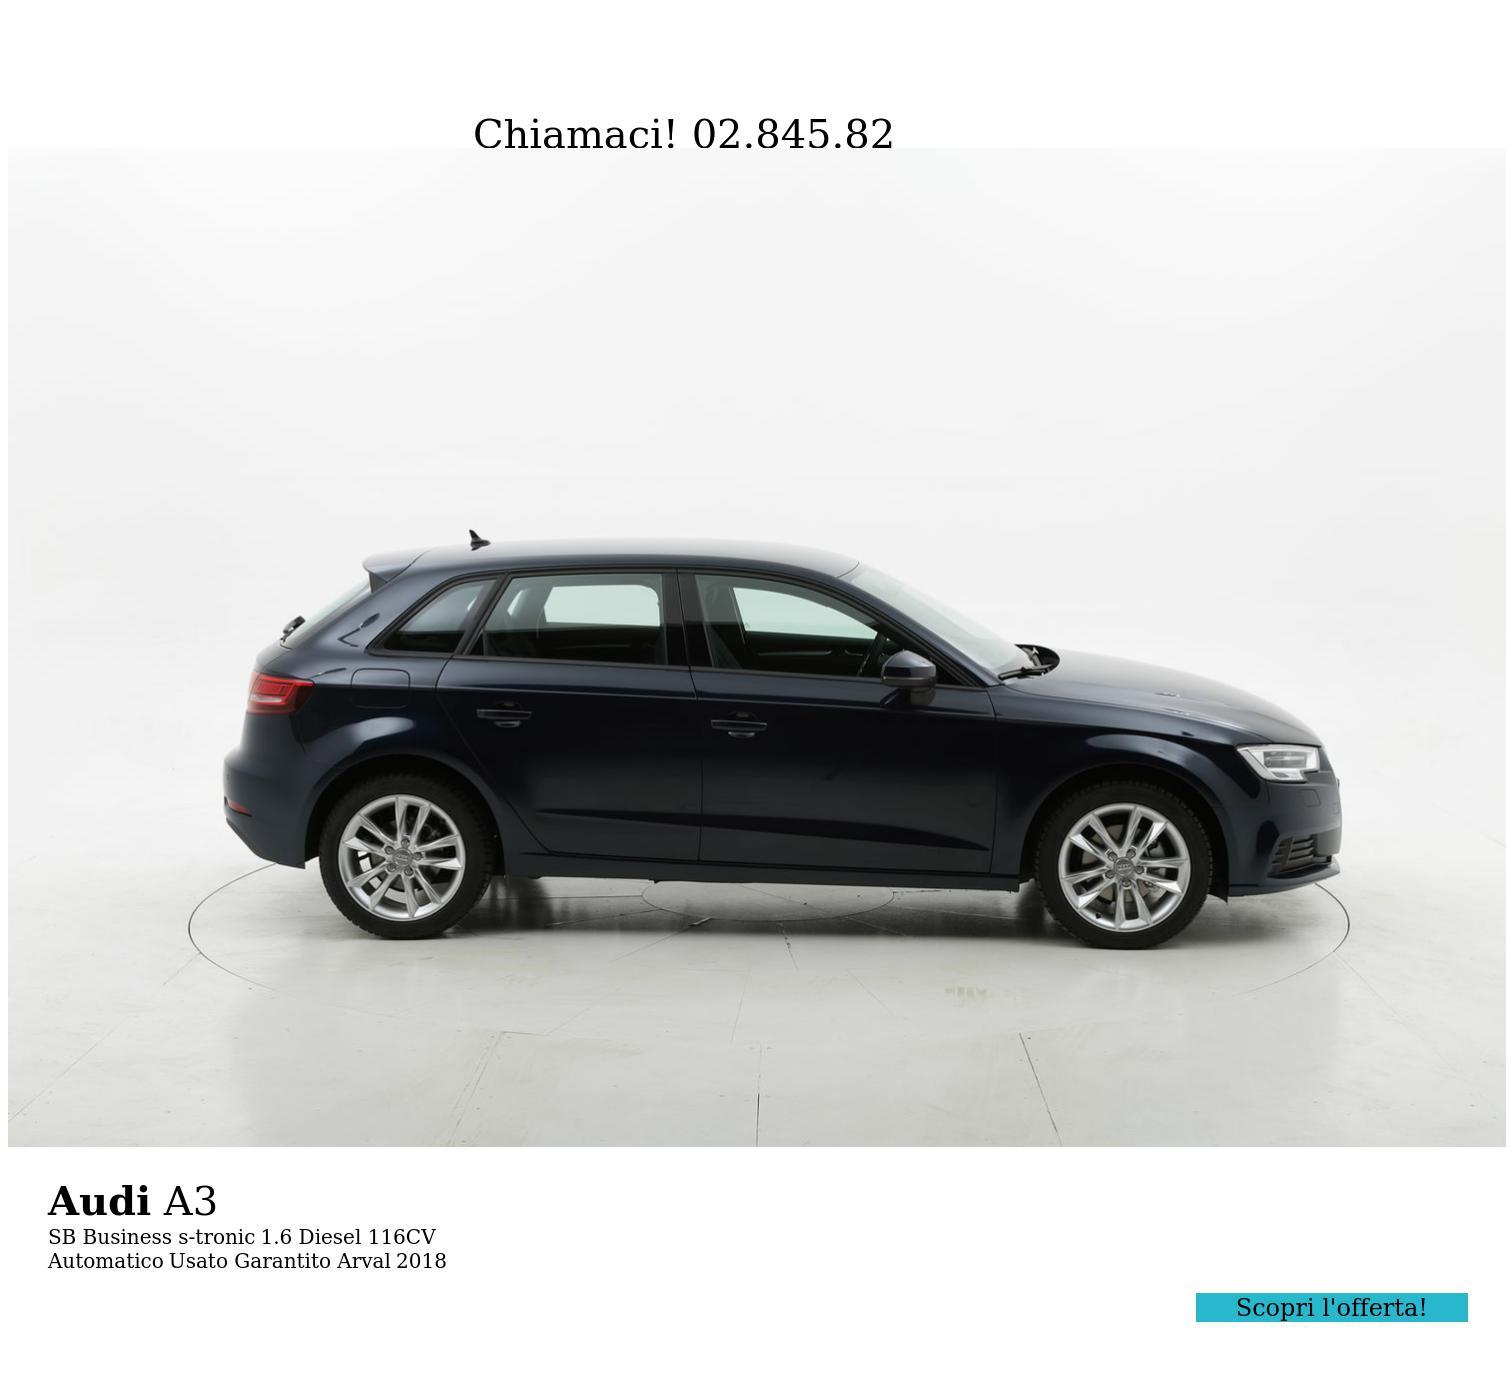 Audi A3 SB Business s-tronic km 0 diesel blu   brumbrum